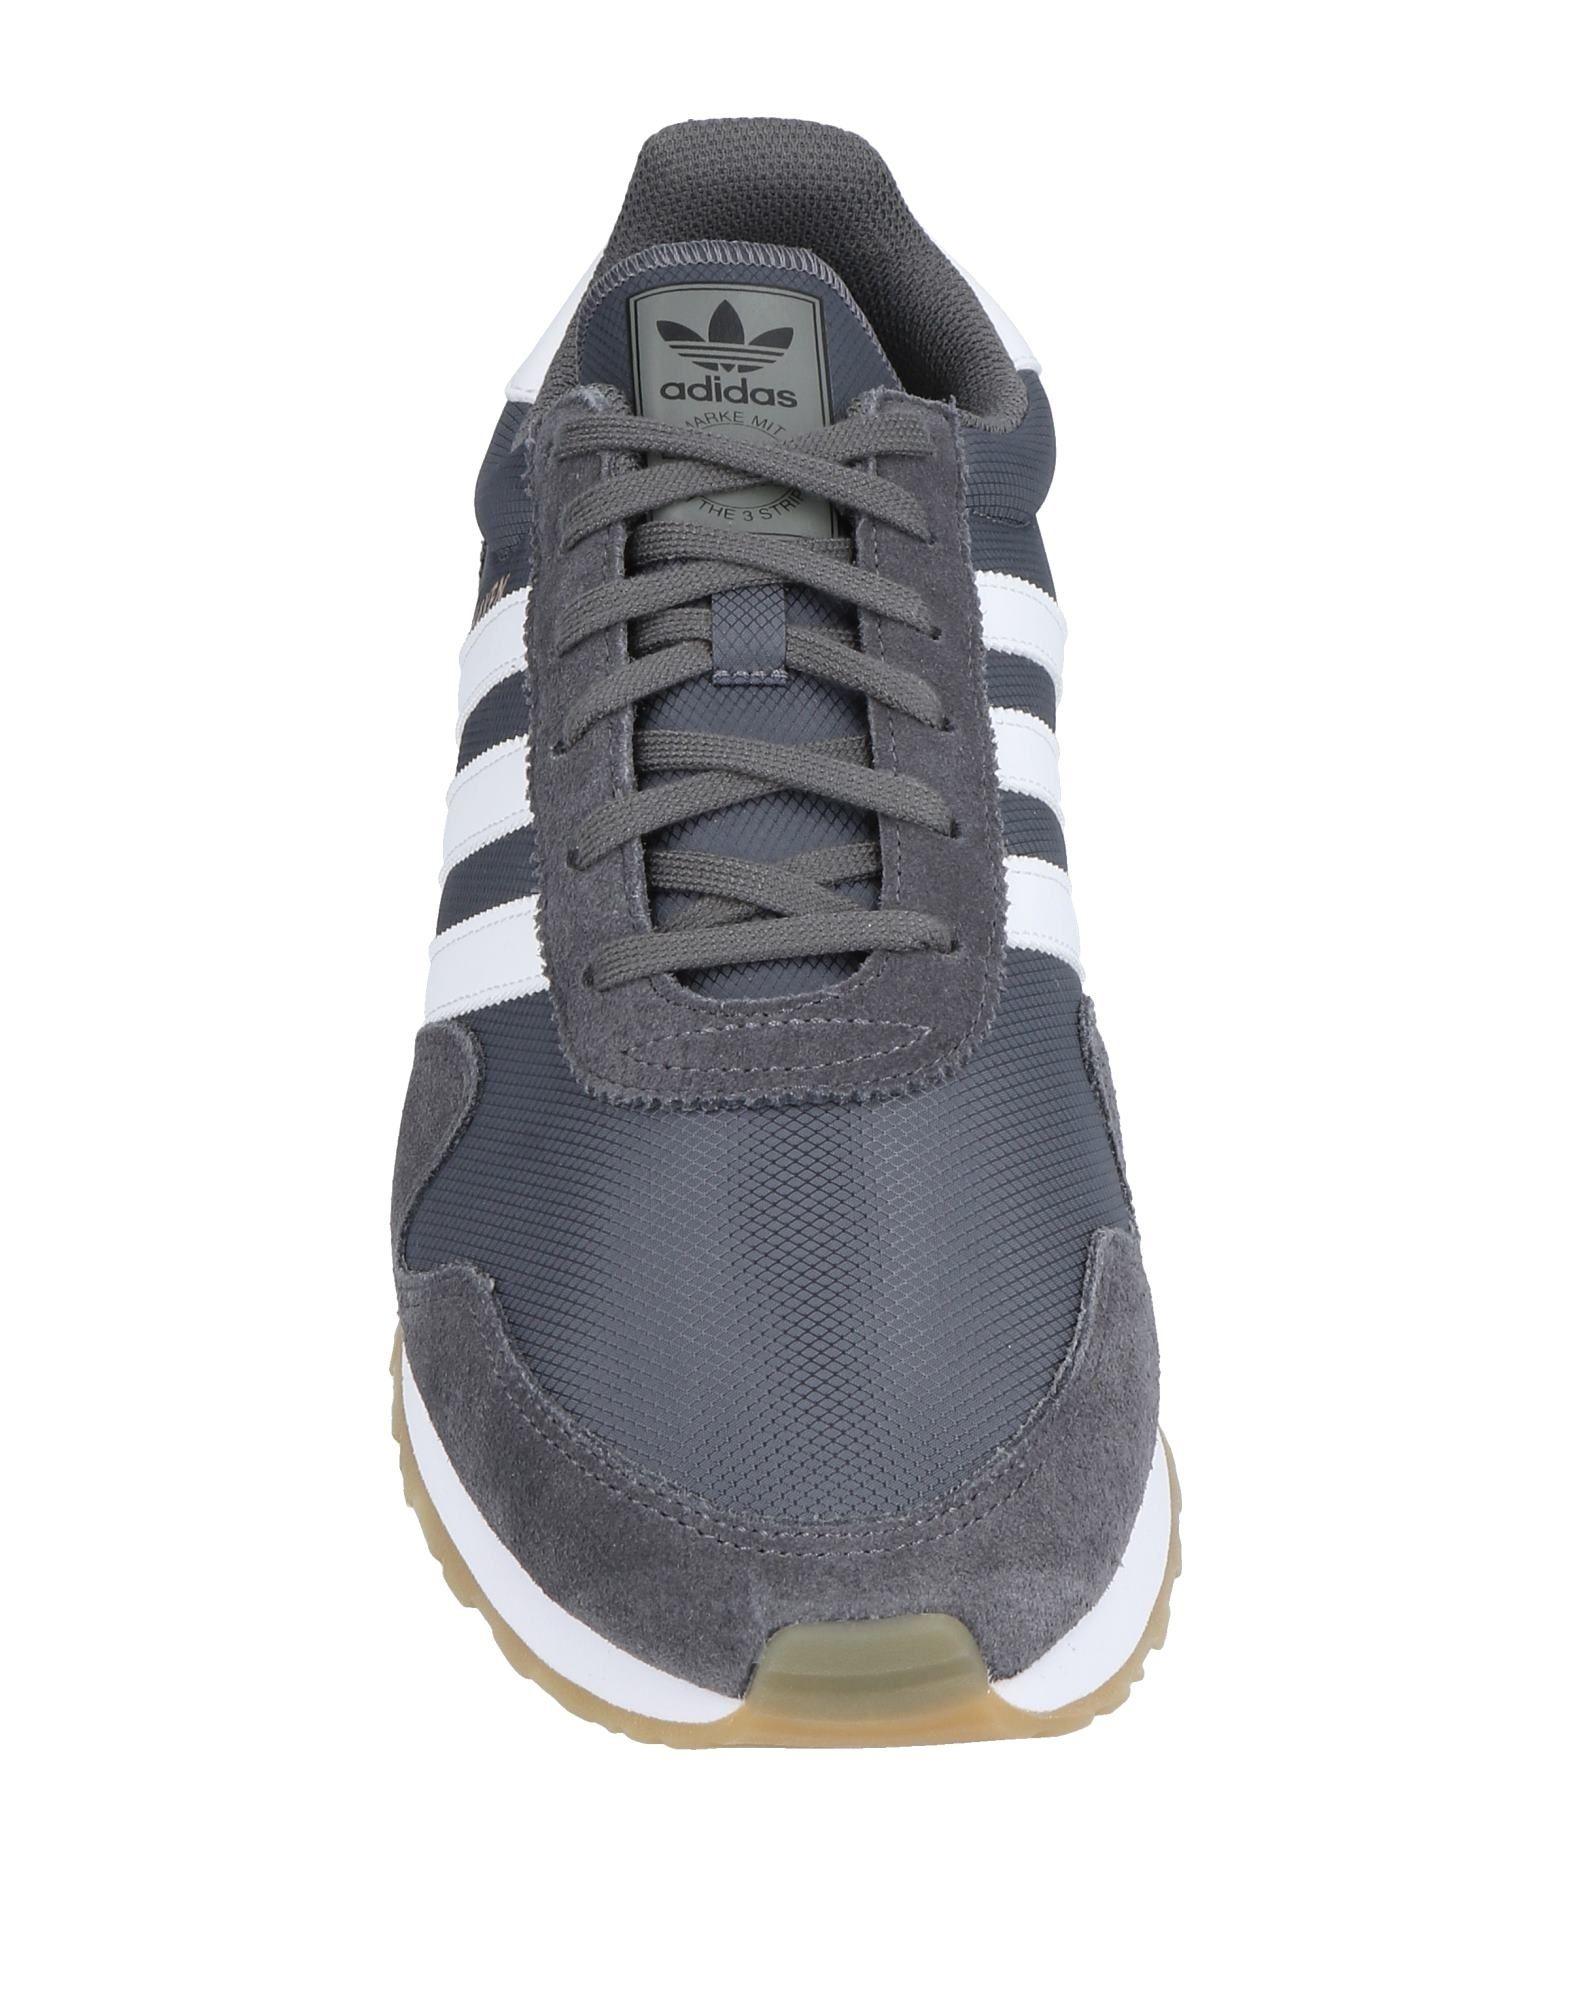 Rabatt Schuhe echte Schuhe Rabatt Adidas Originals Sneakers Herren  11468159VO 31381e